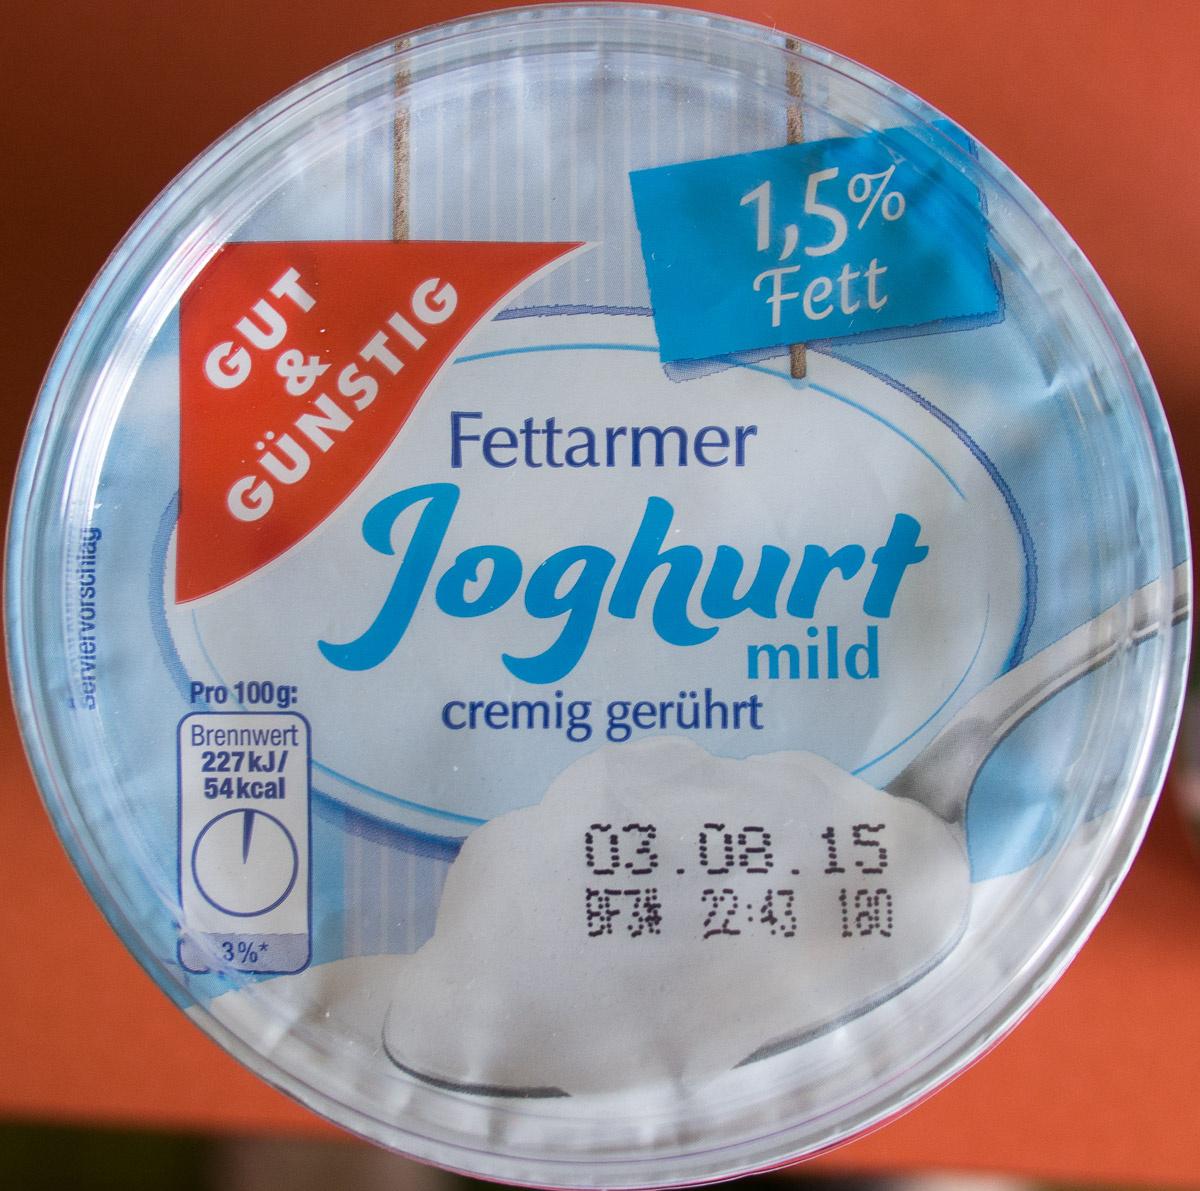 Joghurt - Product - de